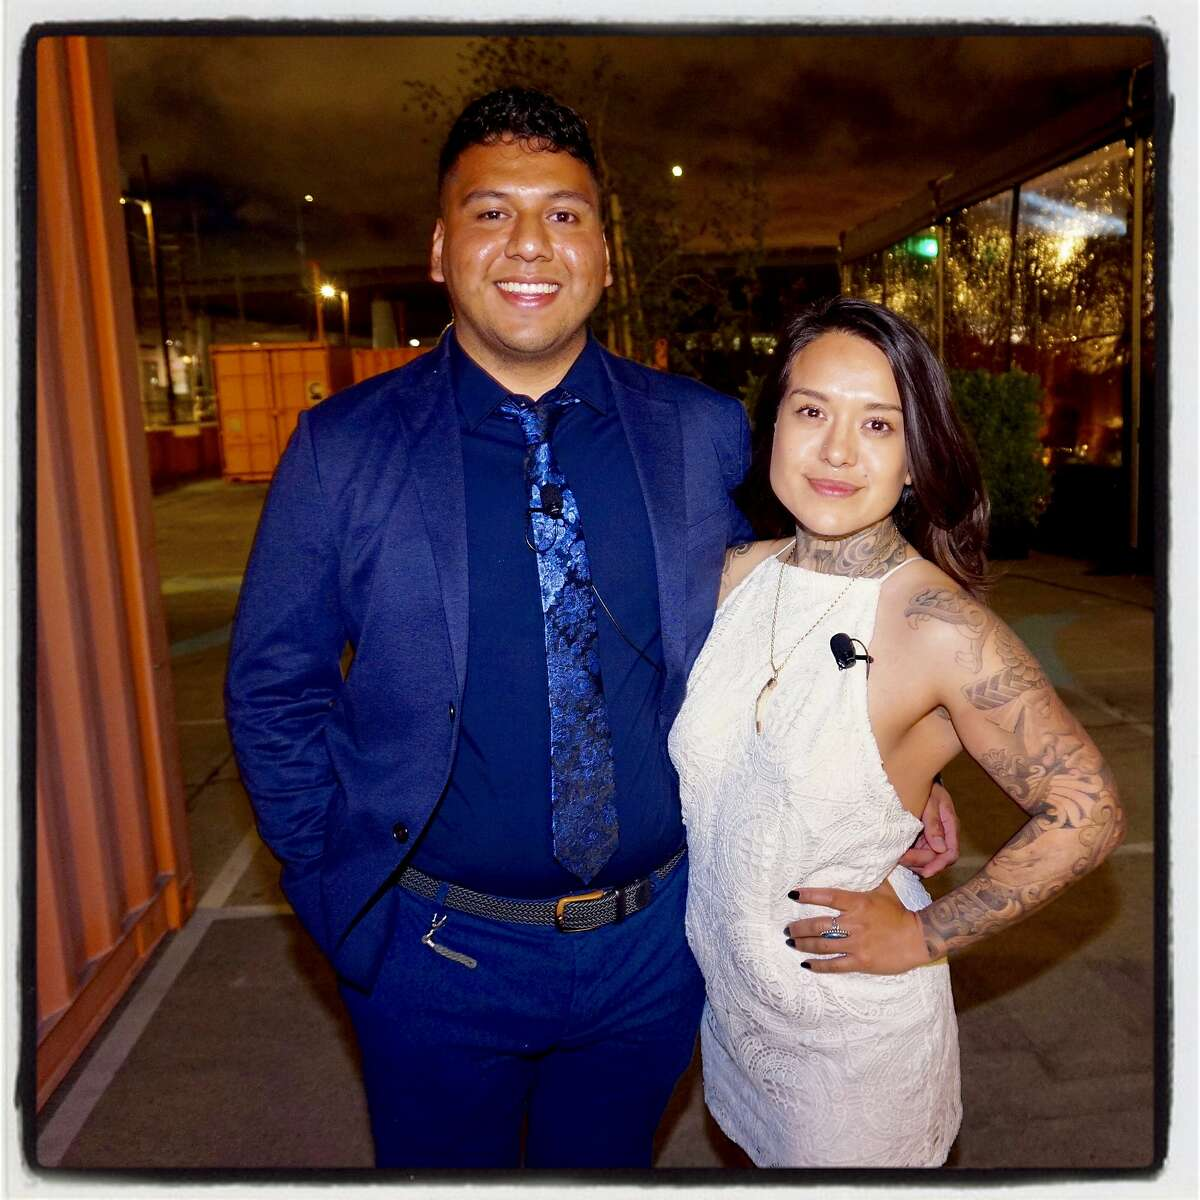 CCA graduates at Daniel Ortiz and Arleene Correa Valencia at the school's scholarship fundraising dinner. May 23, 2018.